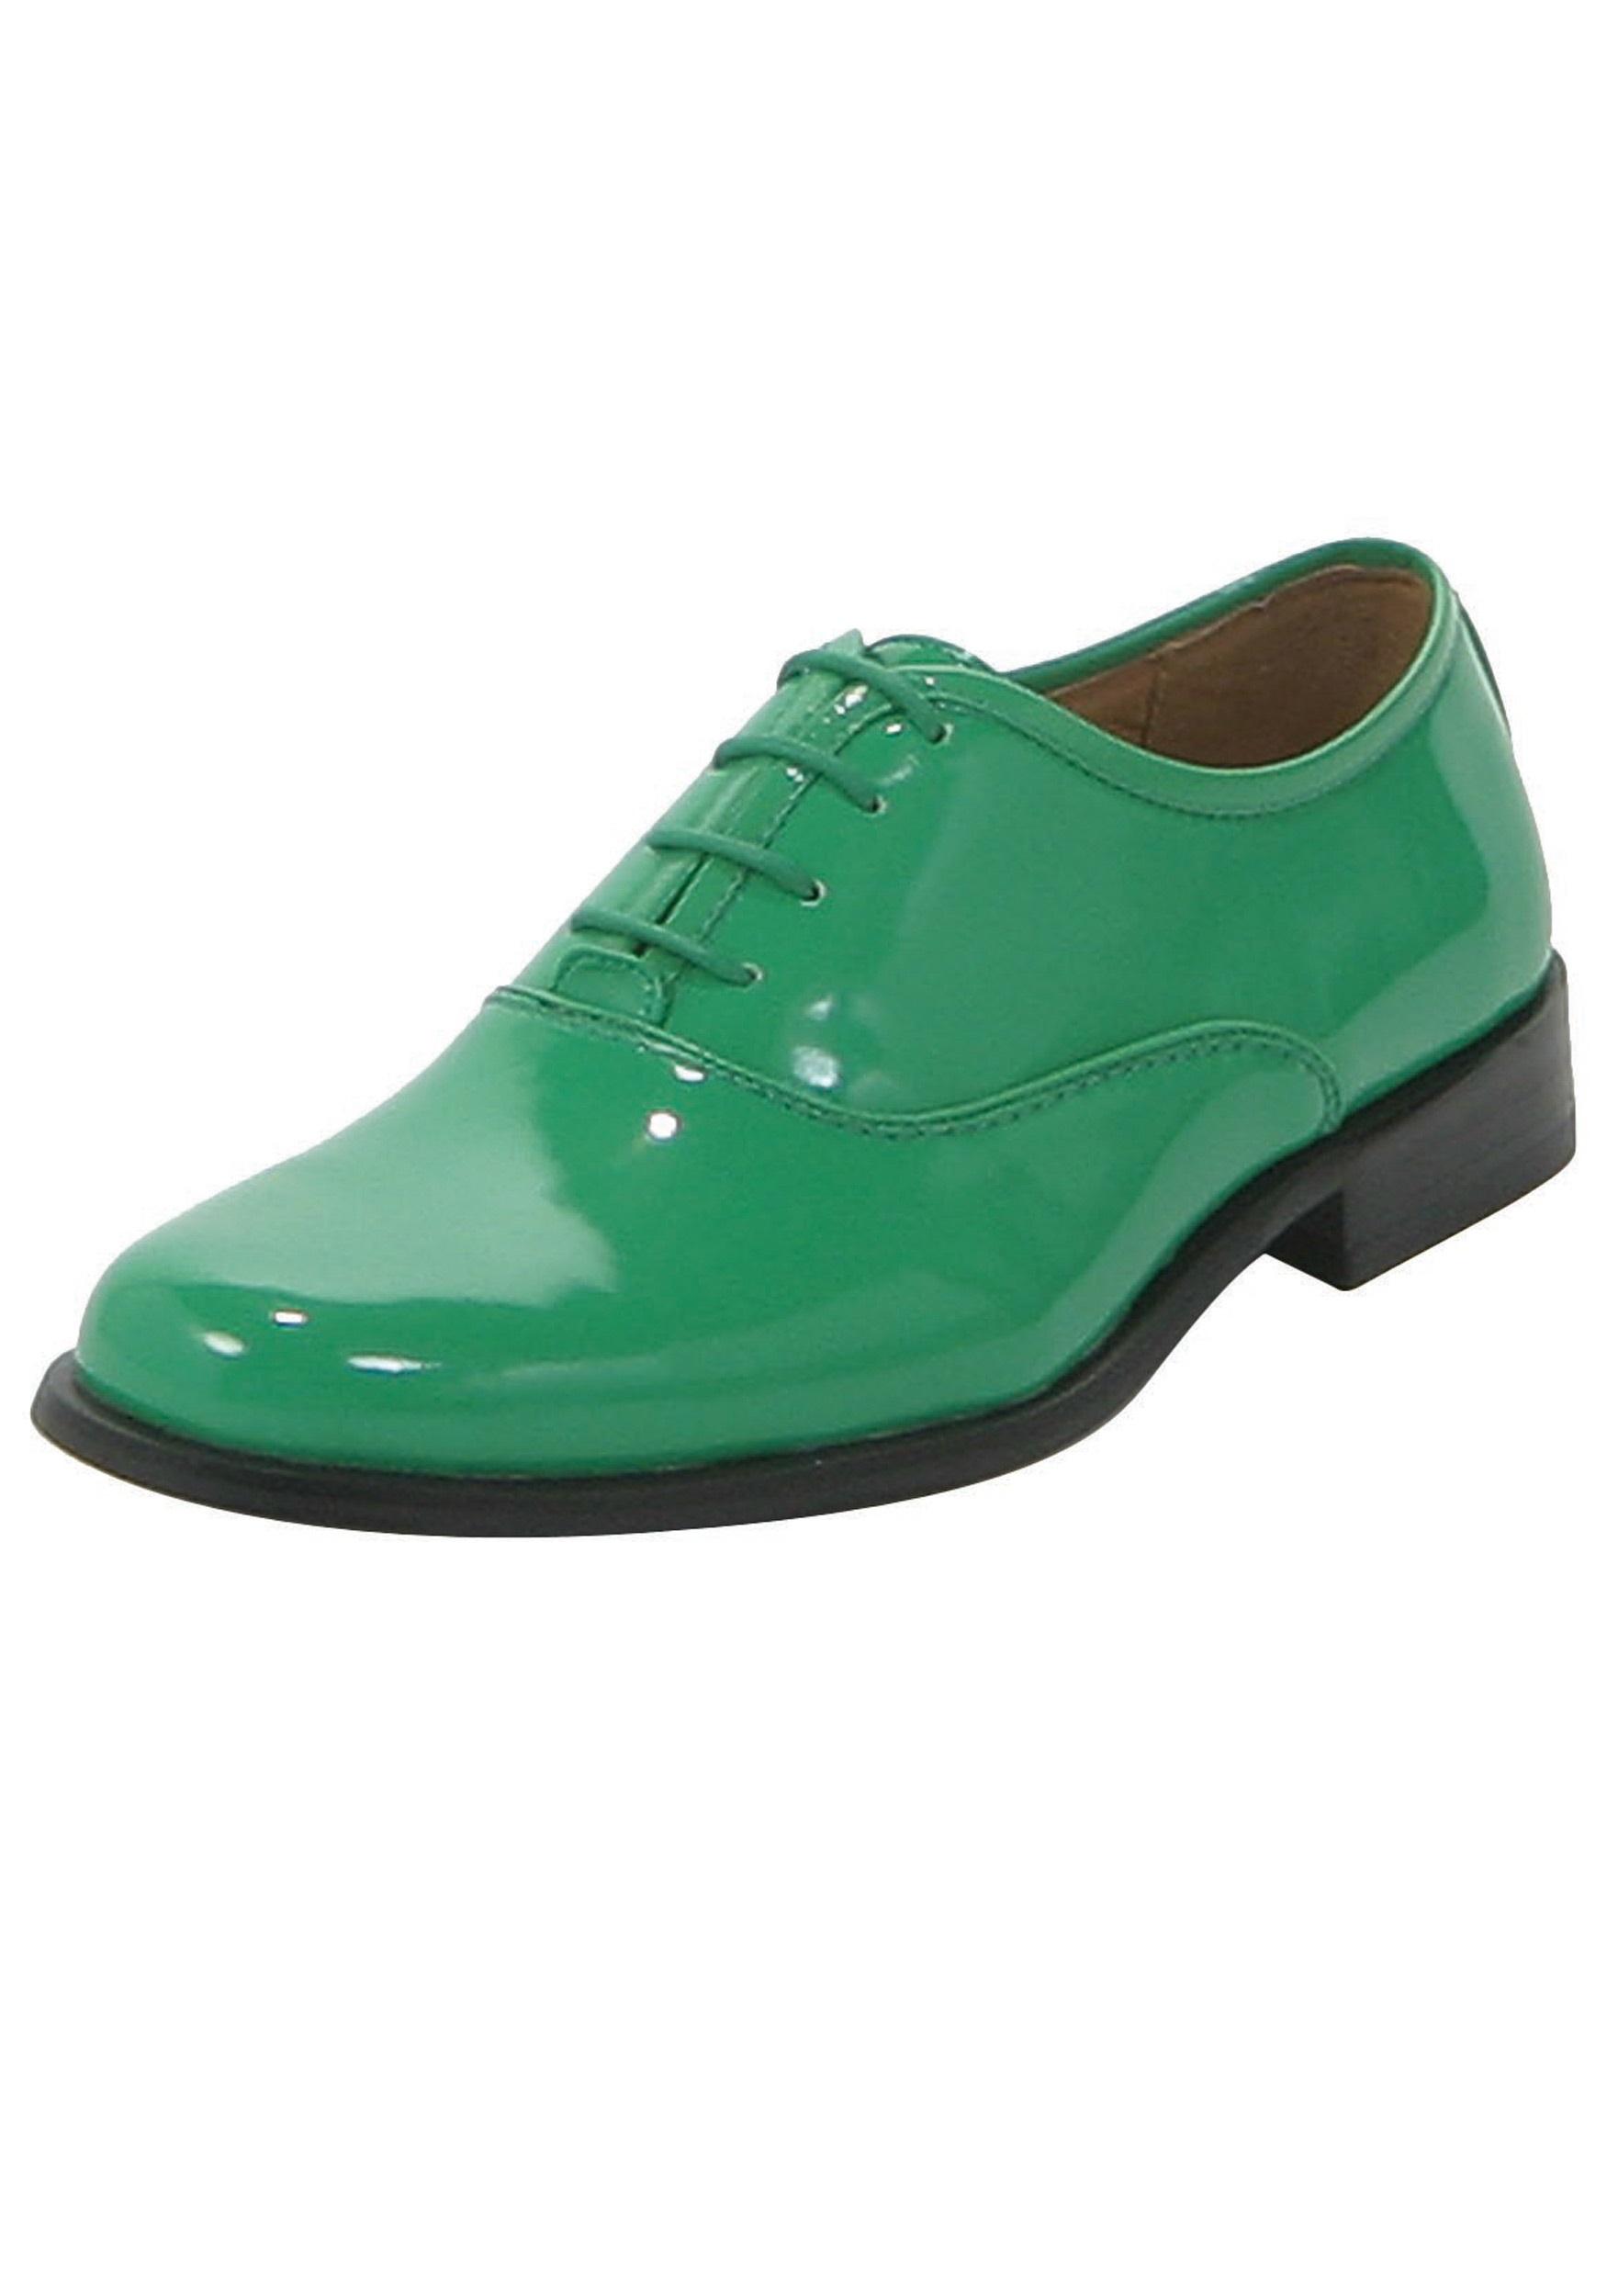 mens green shoes